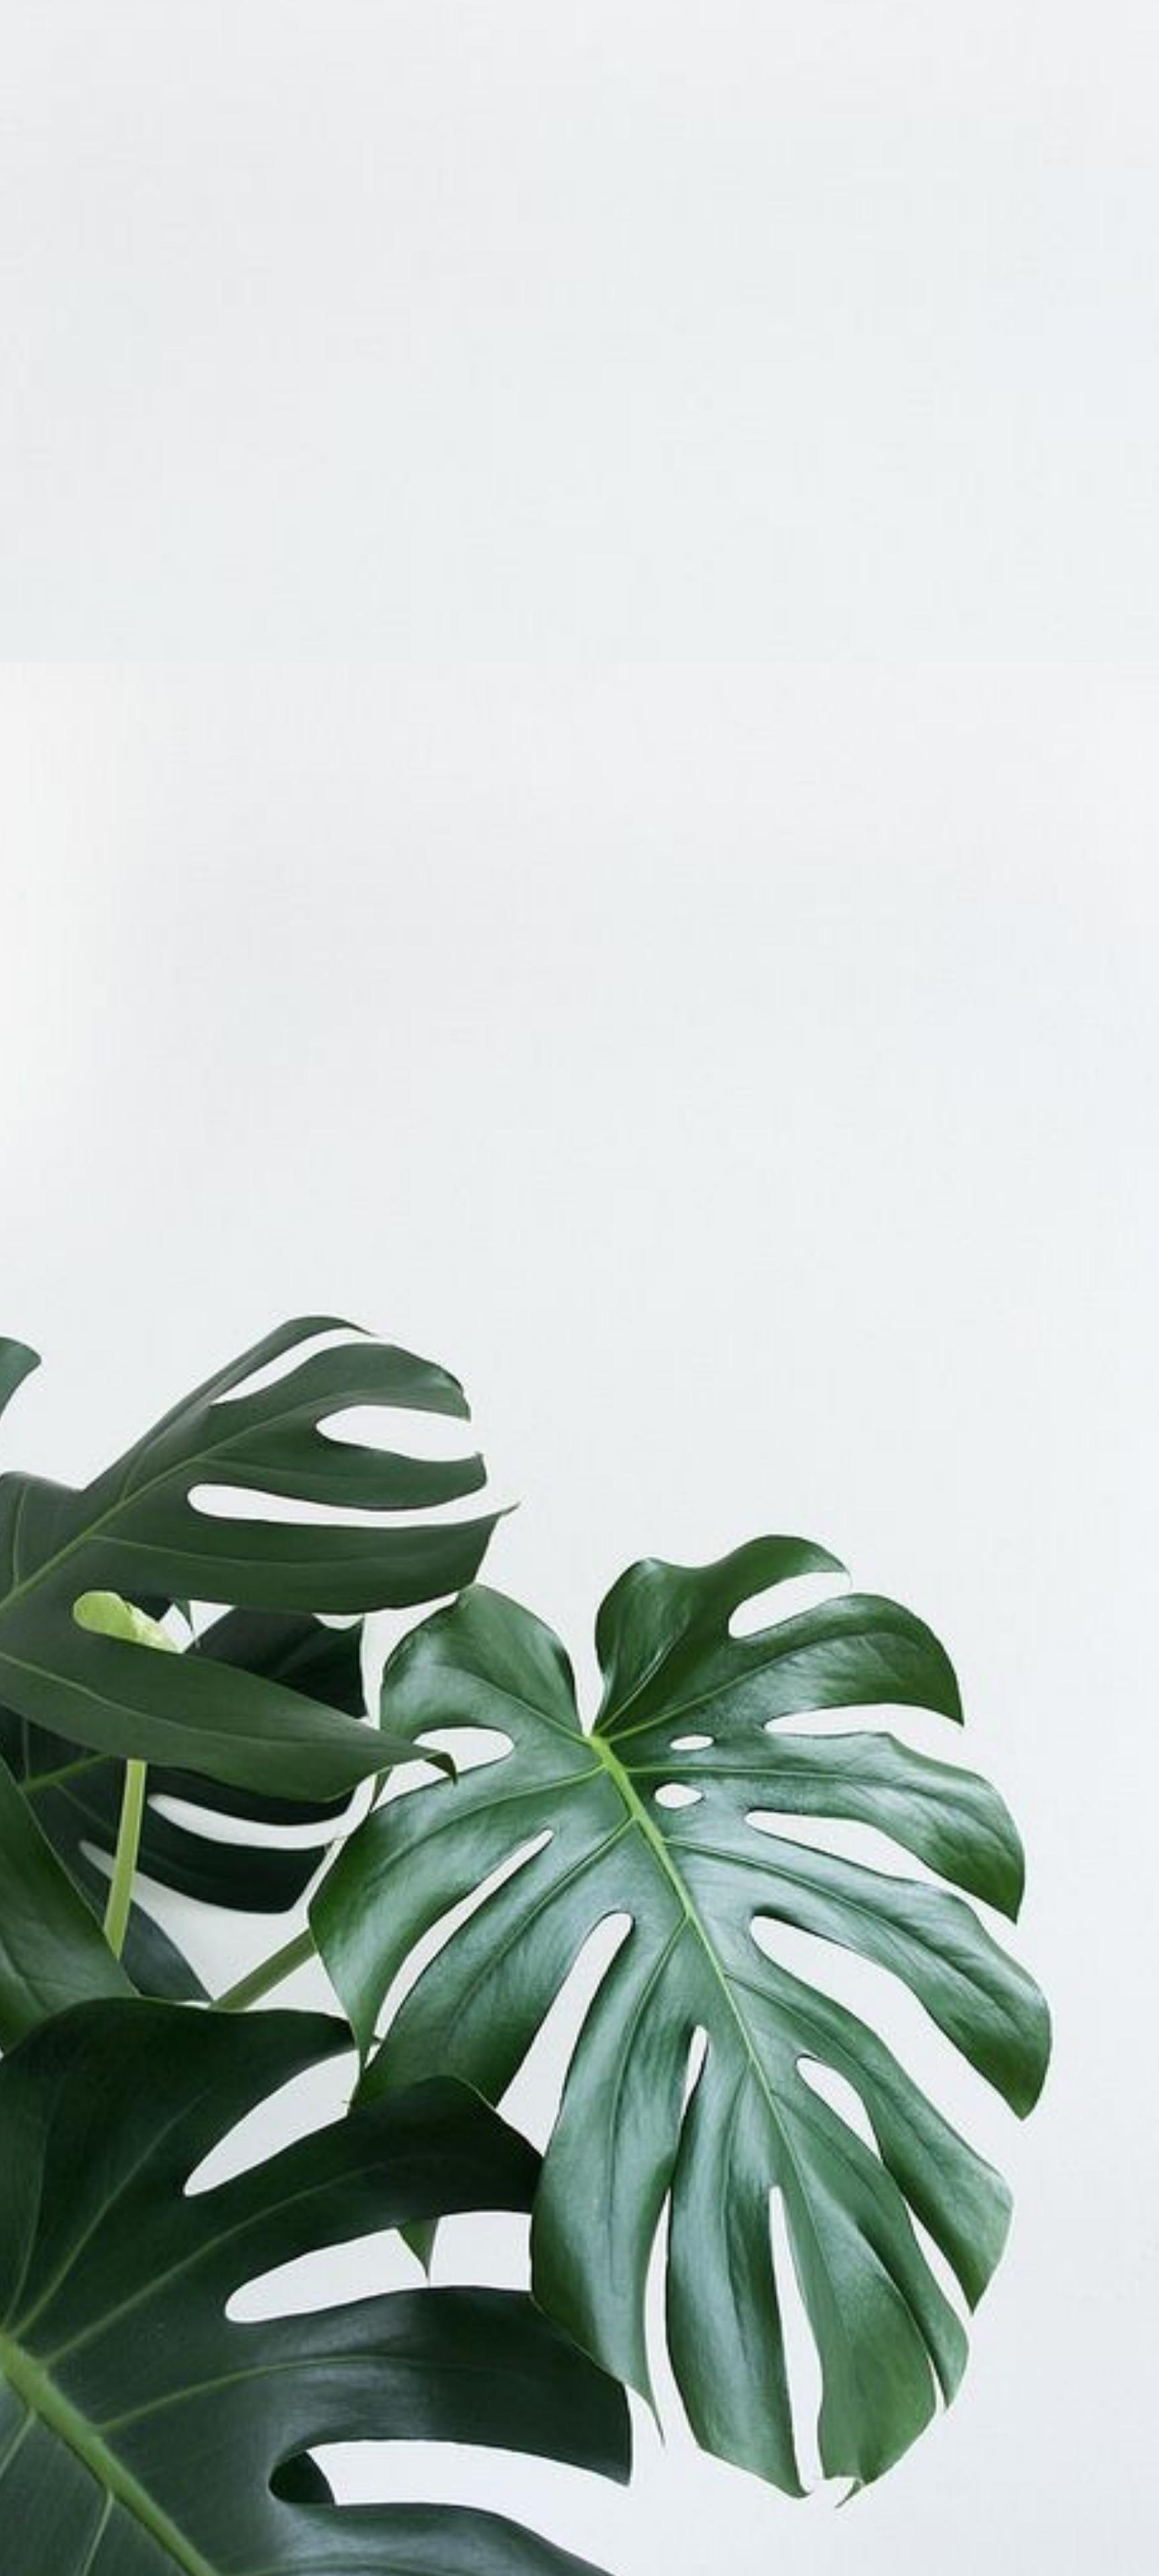 HD Aesthetic Minimal Plant Phone Background | Leaves ...